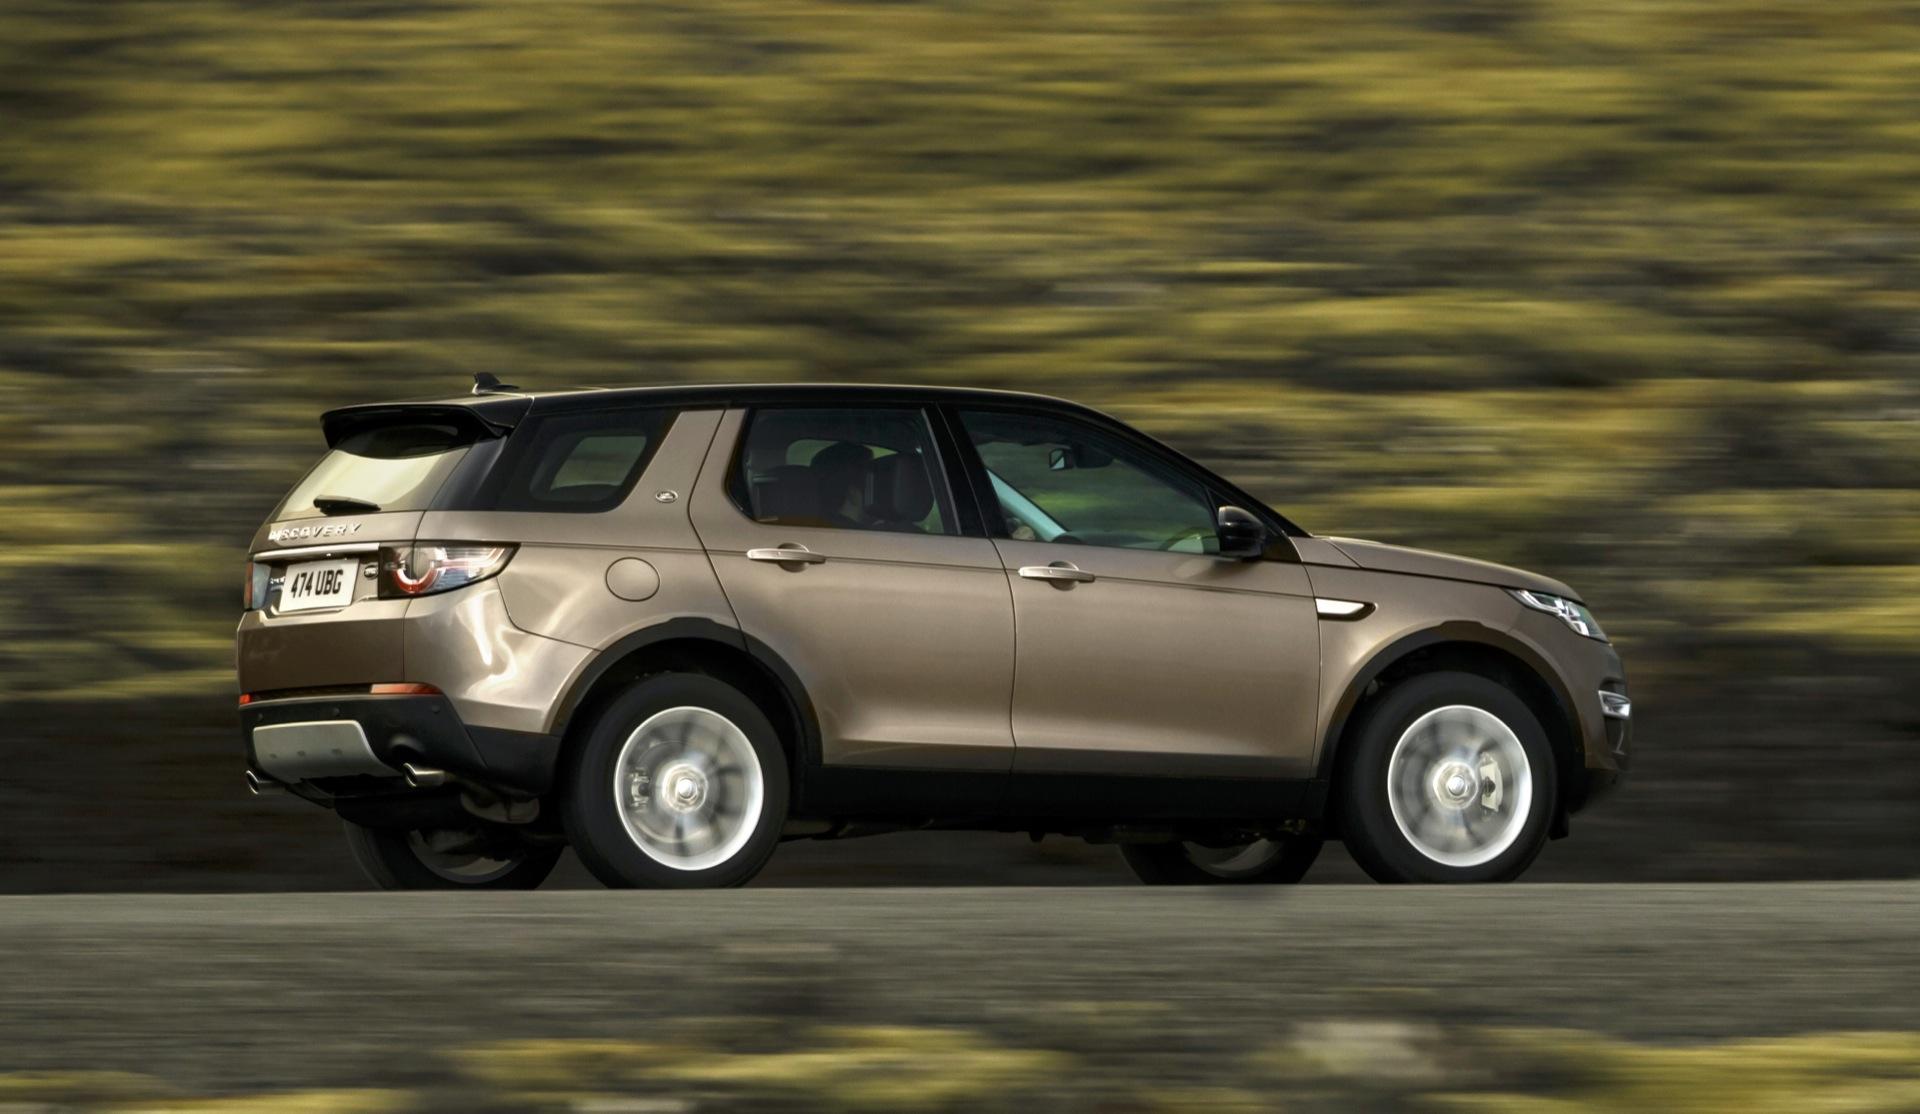 The Motoring World Honest John Awards Land Rover And 2014 Gm 4 3l Engine